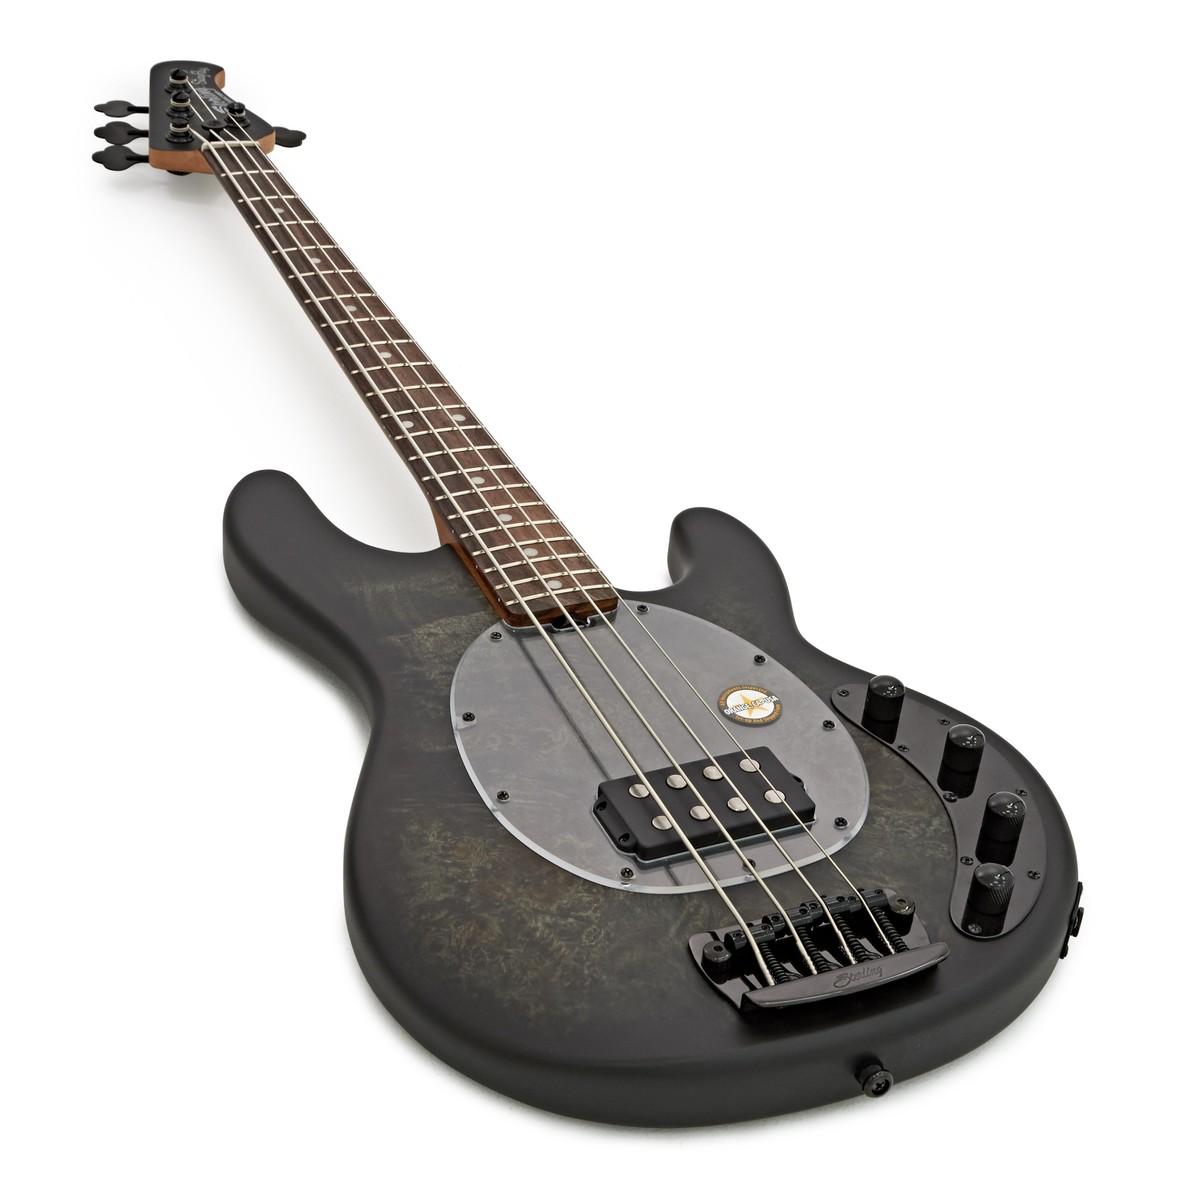 sterling stingray bass rw poplar burl trans black at gear4music. Black Bedroom Furniture Sets. Home Design Ideas